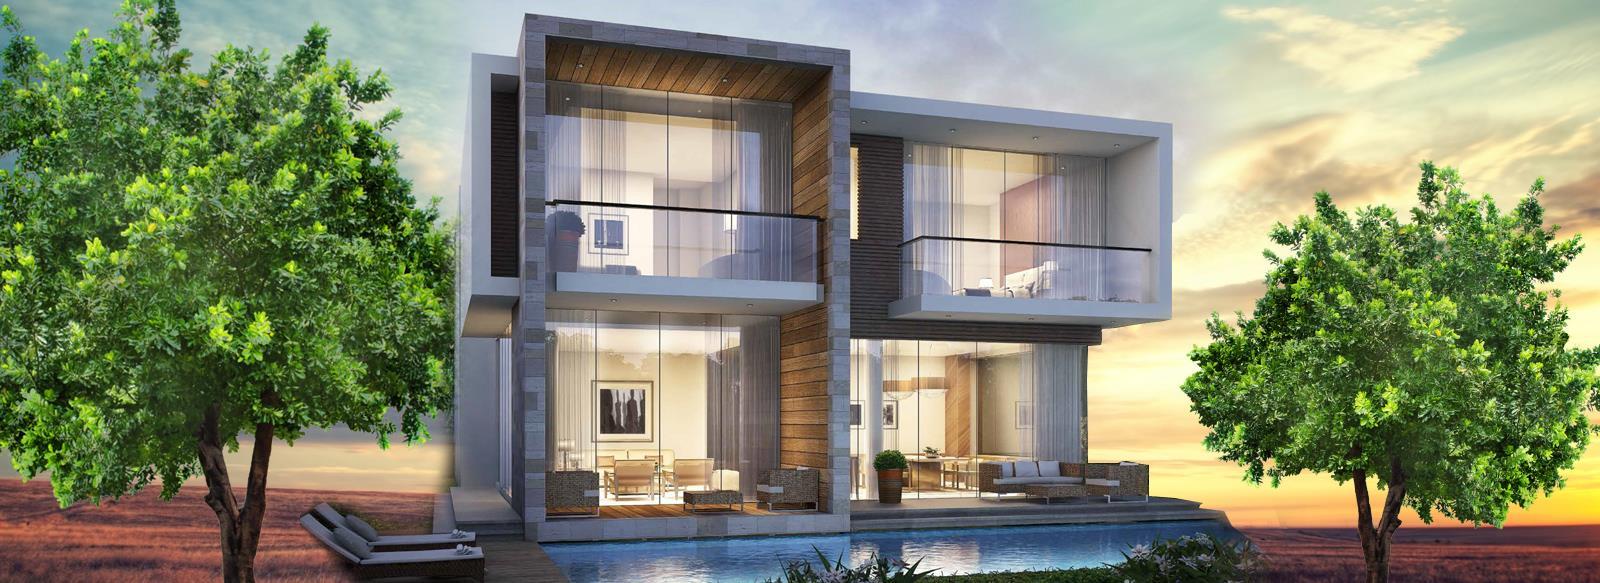 Luxury 3 &amp; 5 Bedroom Villas,<div>Starting from AED 2.5 Million&nbsp;</div>